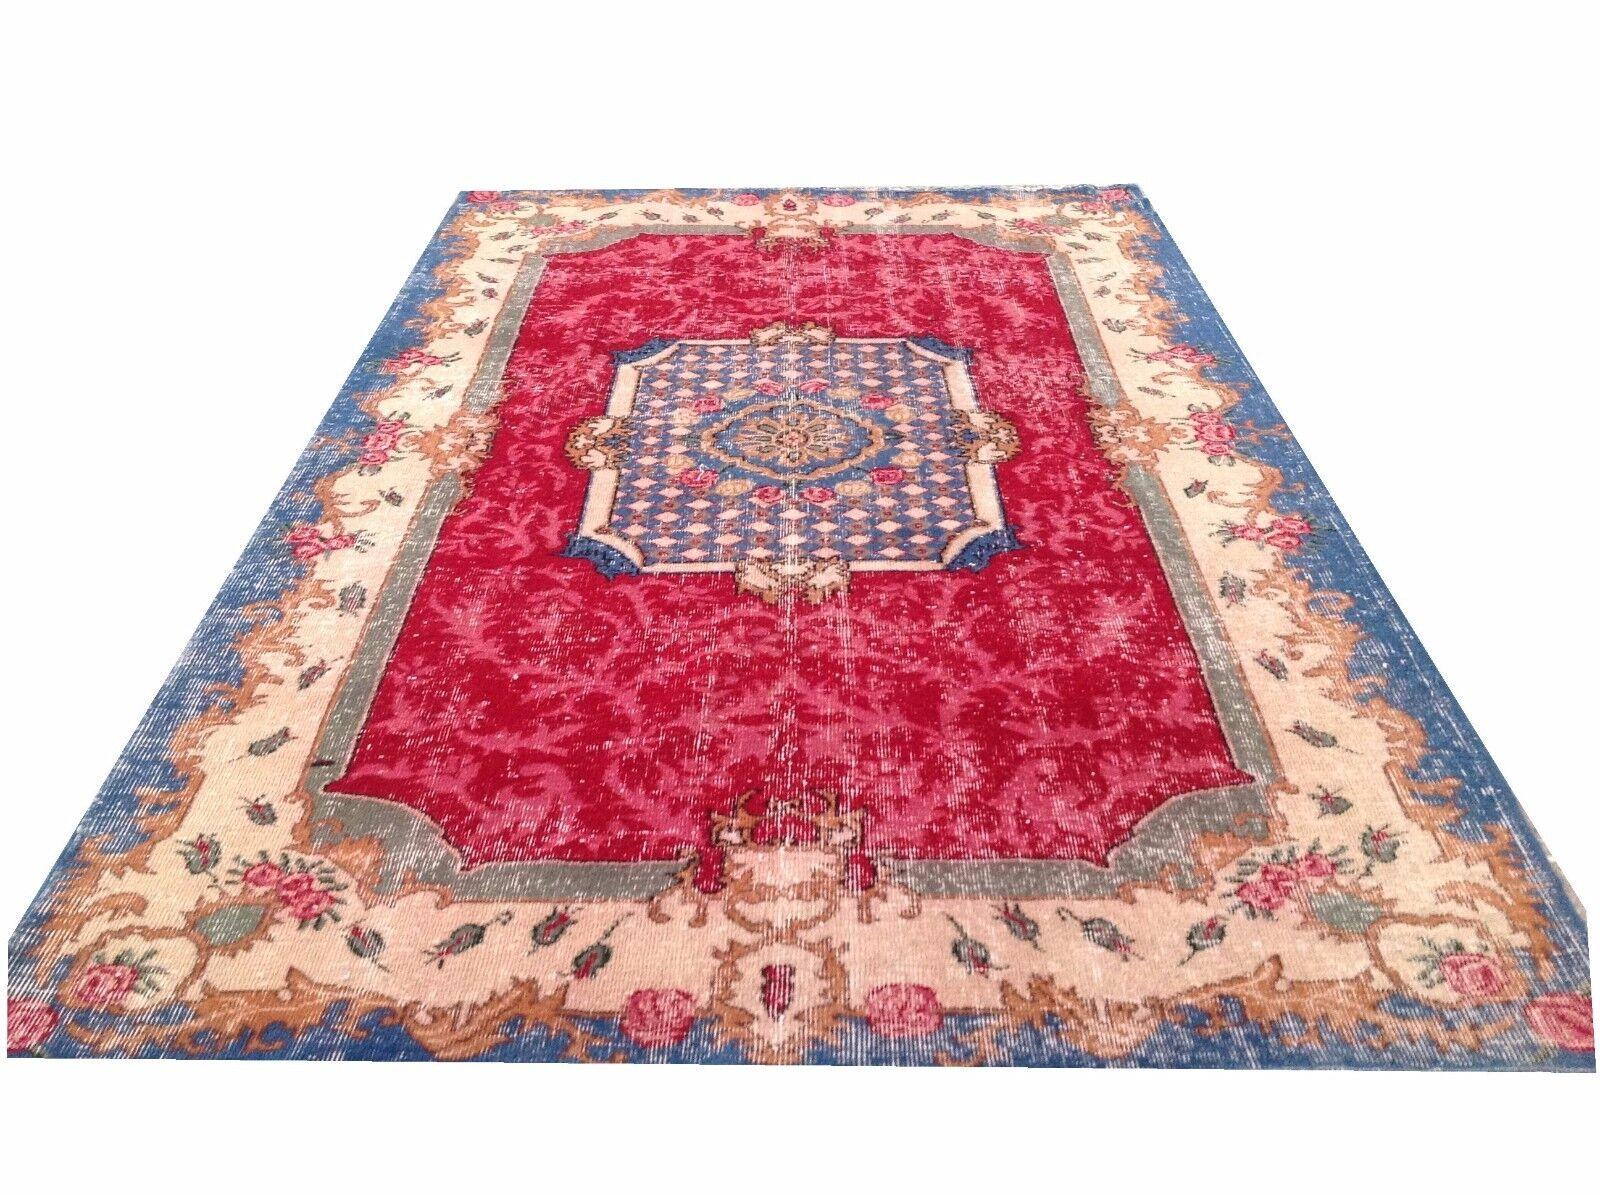 7'11  x 5'1    aqua aqua aqua Blau  rot cream oushak vintage rug carpet tapis teppich 8973ec